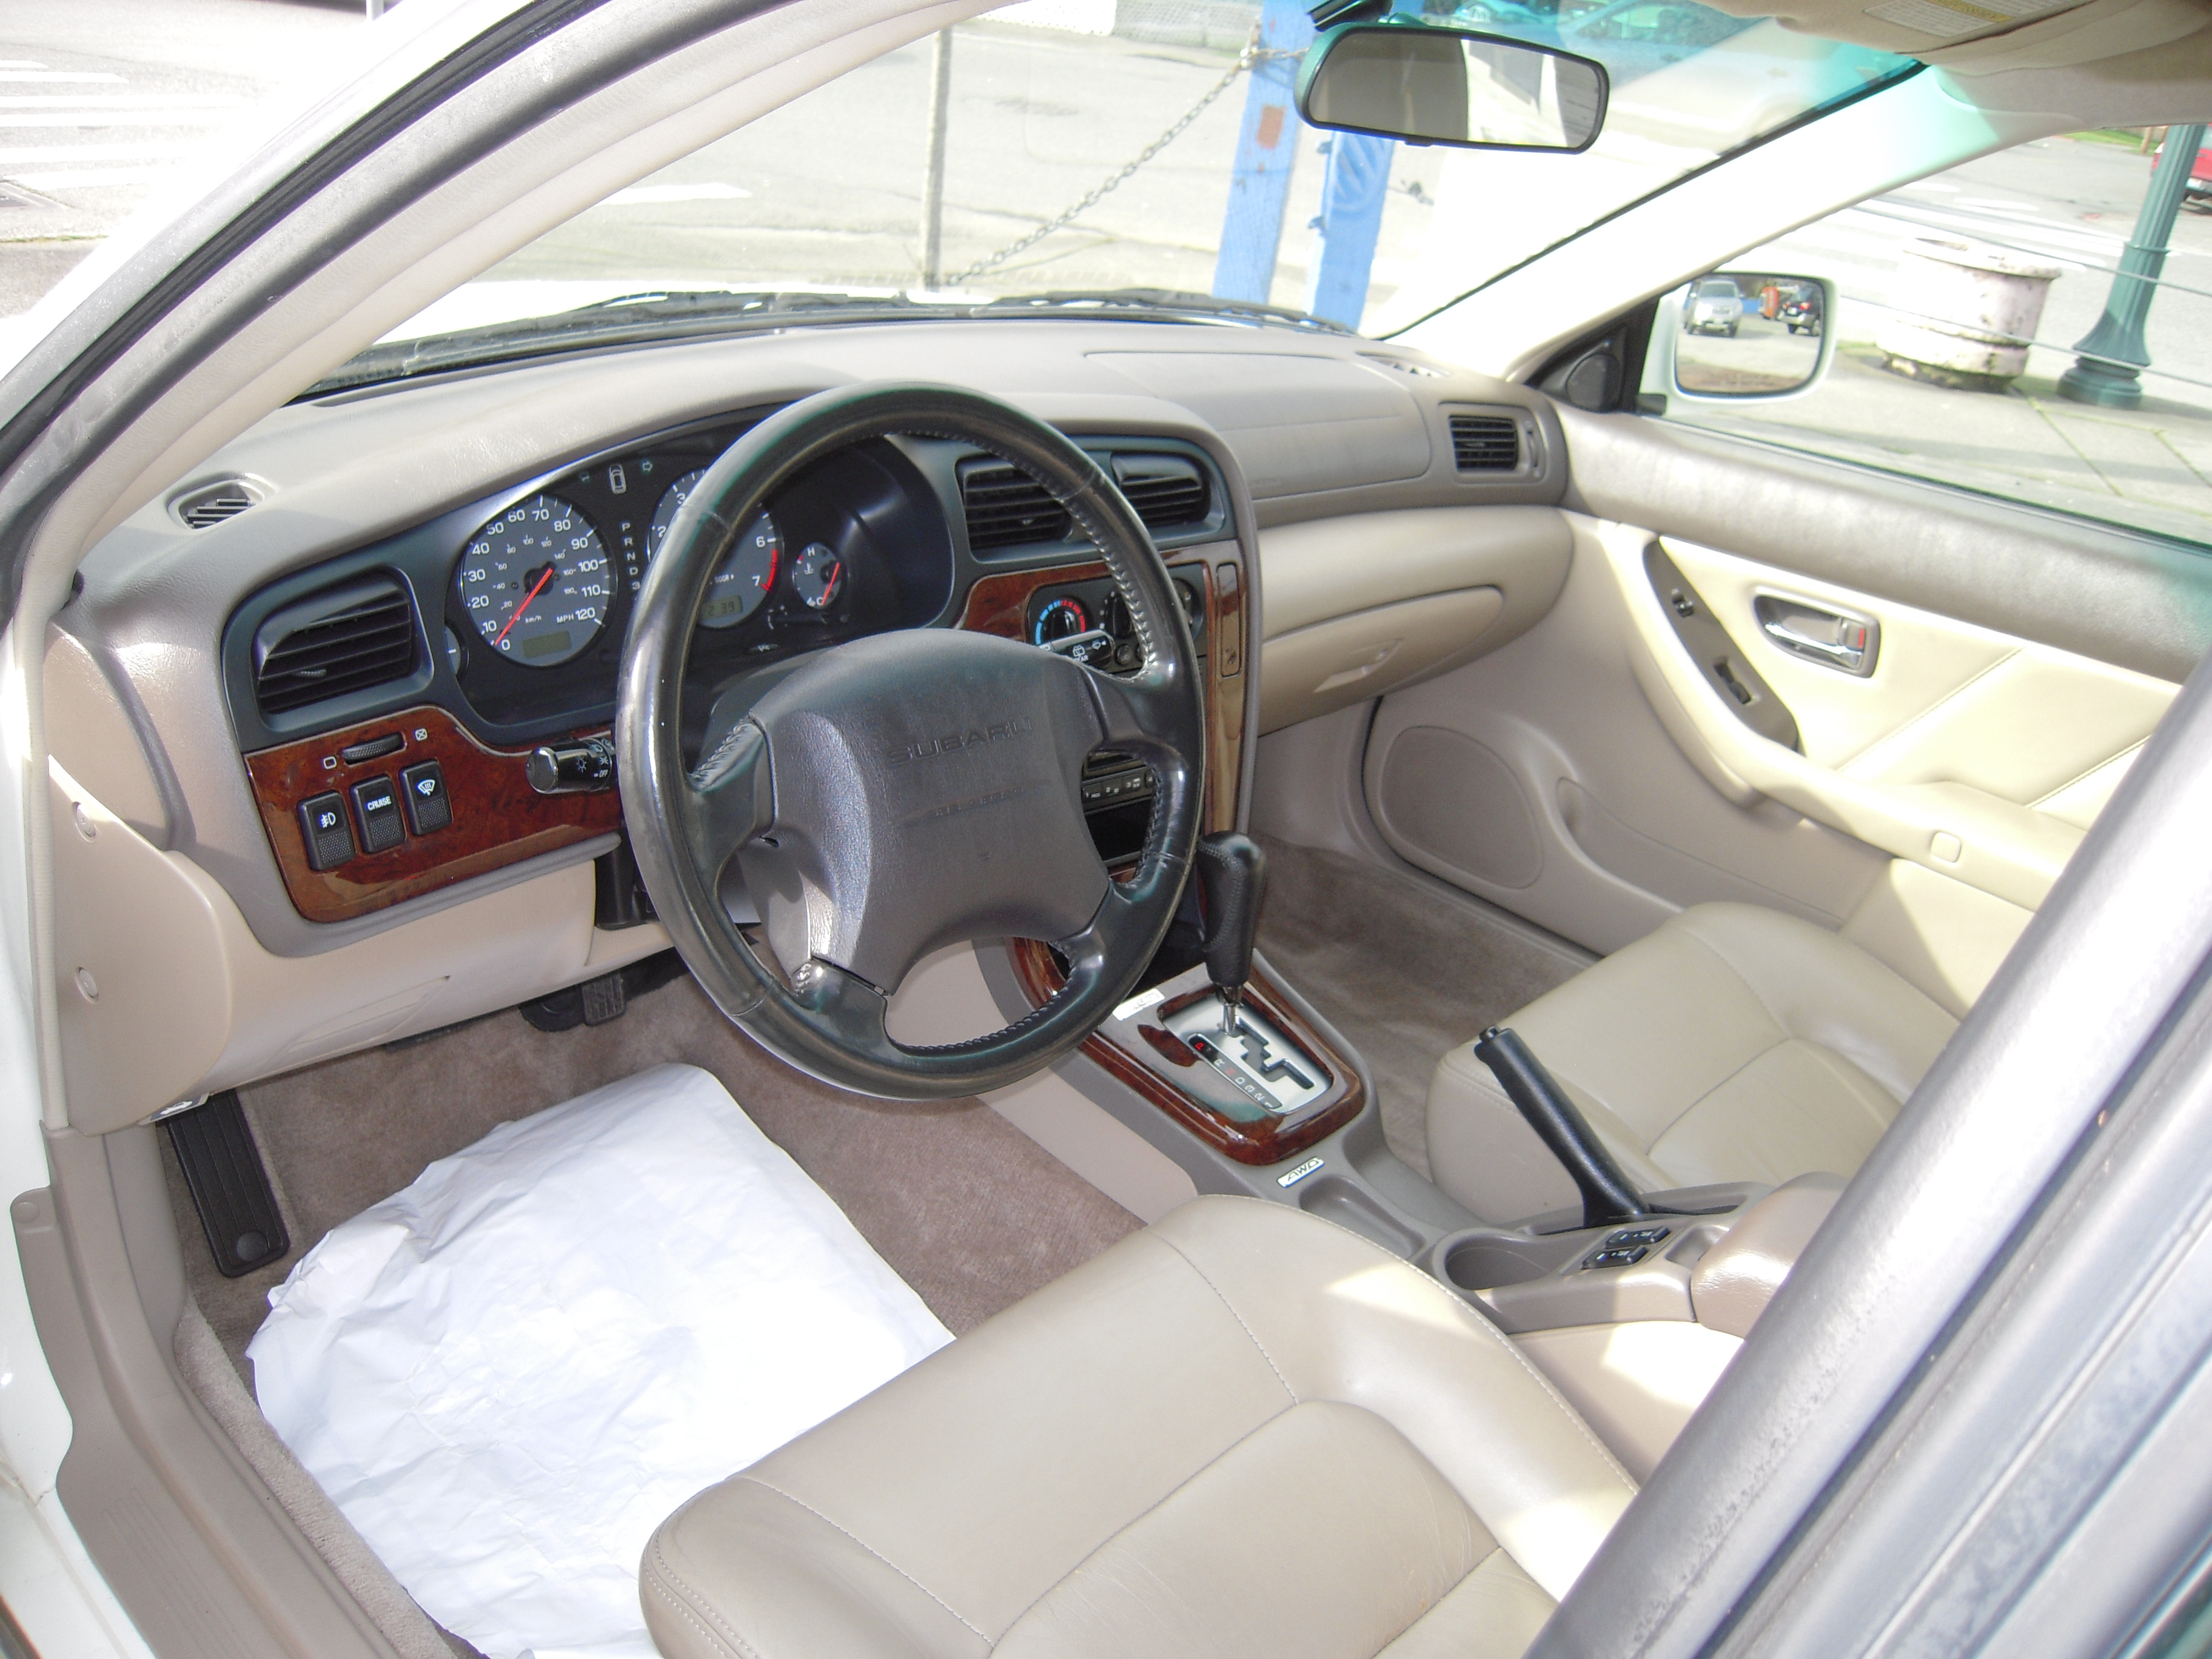 2000 Subaru Outback Information And Photos Zombiedrive Legacy Wagon 8